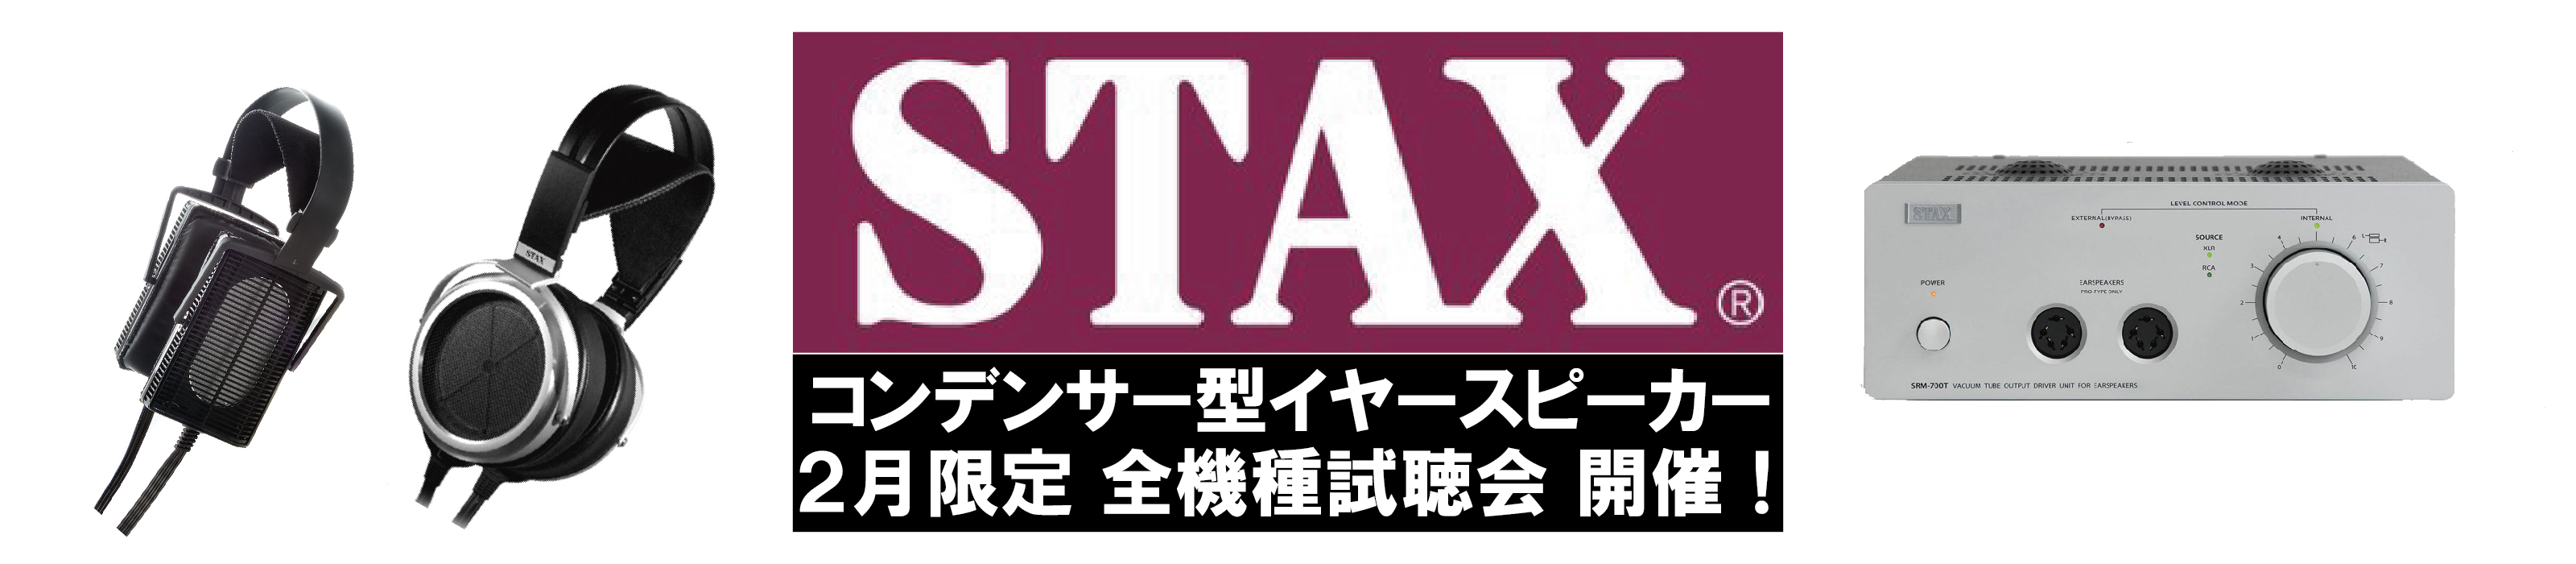 STAX イヤースピーカー 2月限定 全機種試聴会 開催!